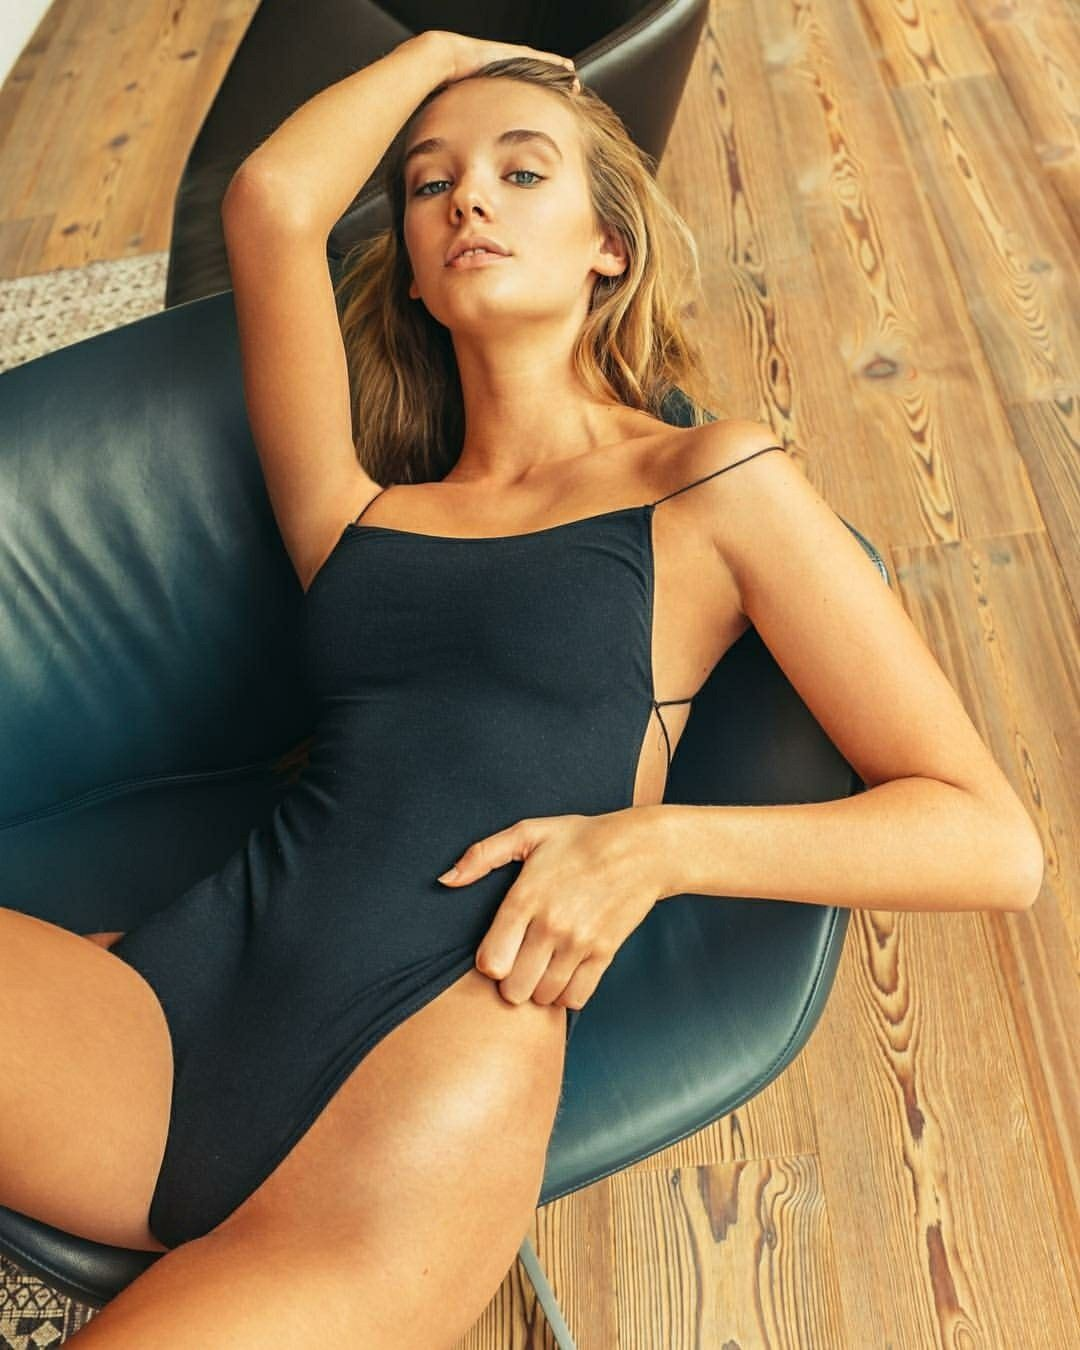 Morgan fletchall lingerie nude (85 photo)